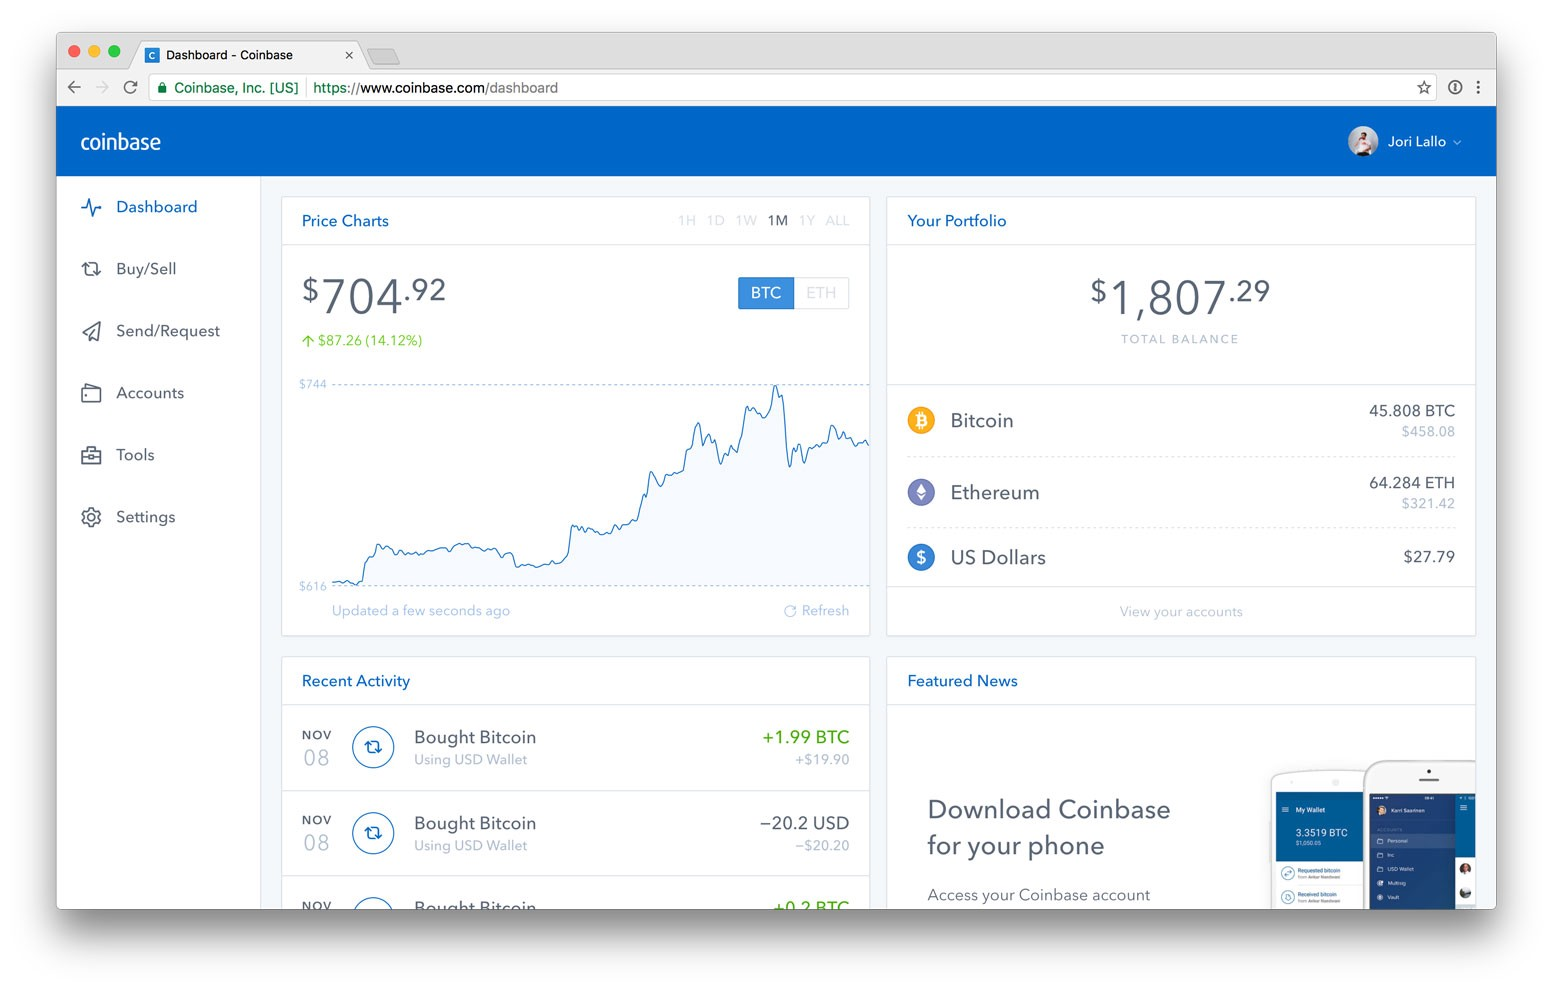 Coinbase menu screen